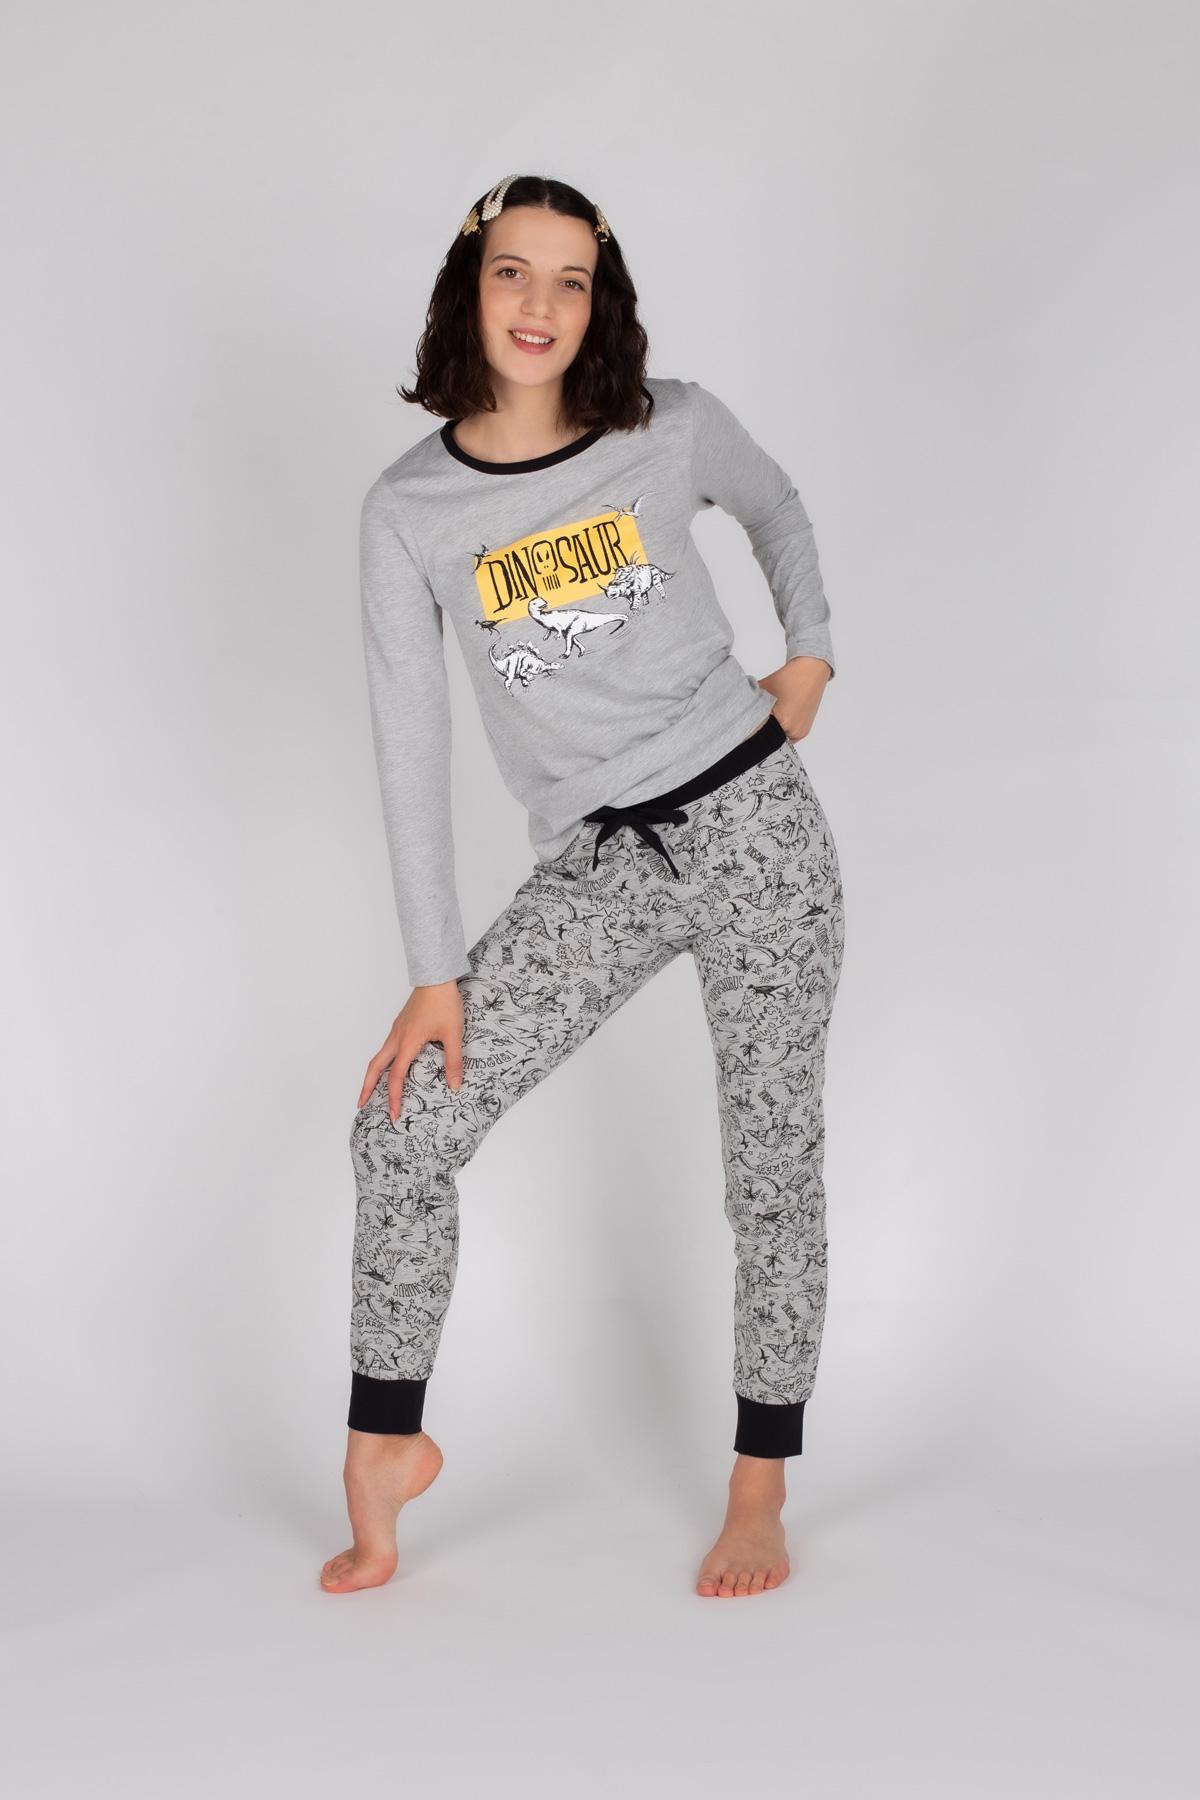 Kadın Pamuklu Uzun Pijama Takımı